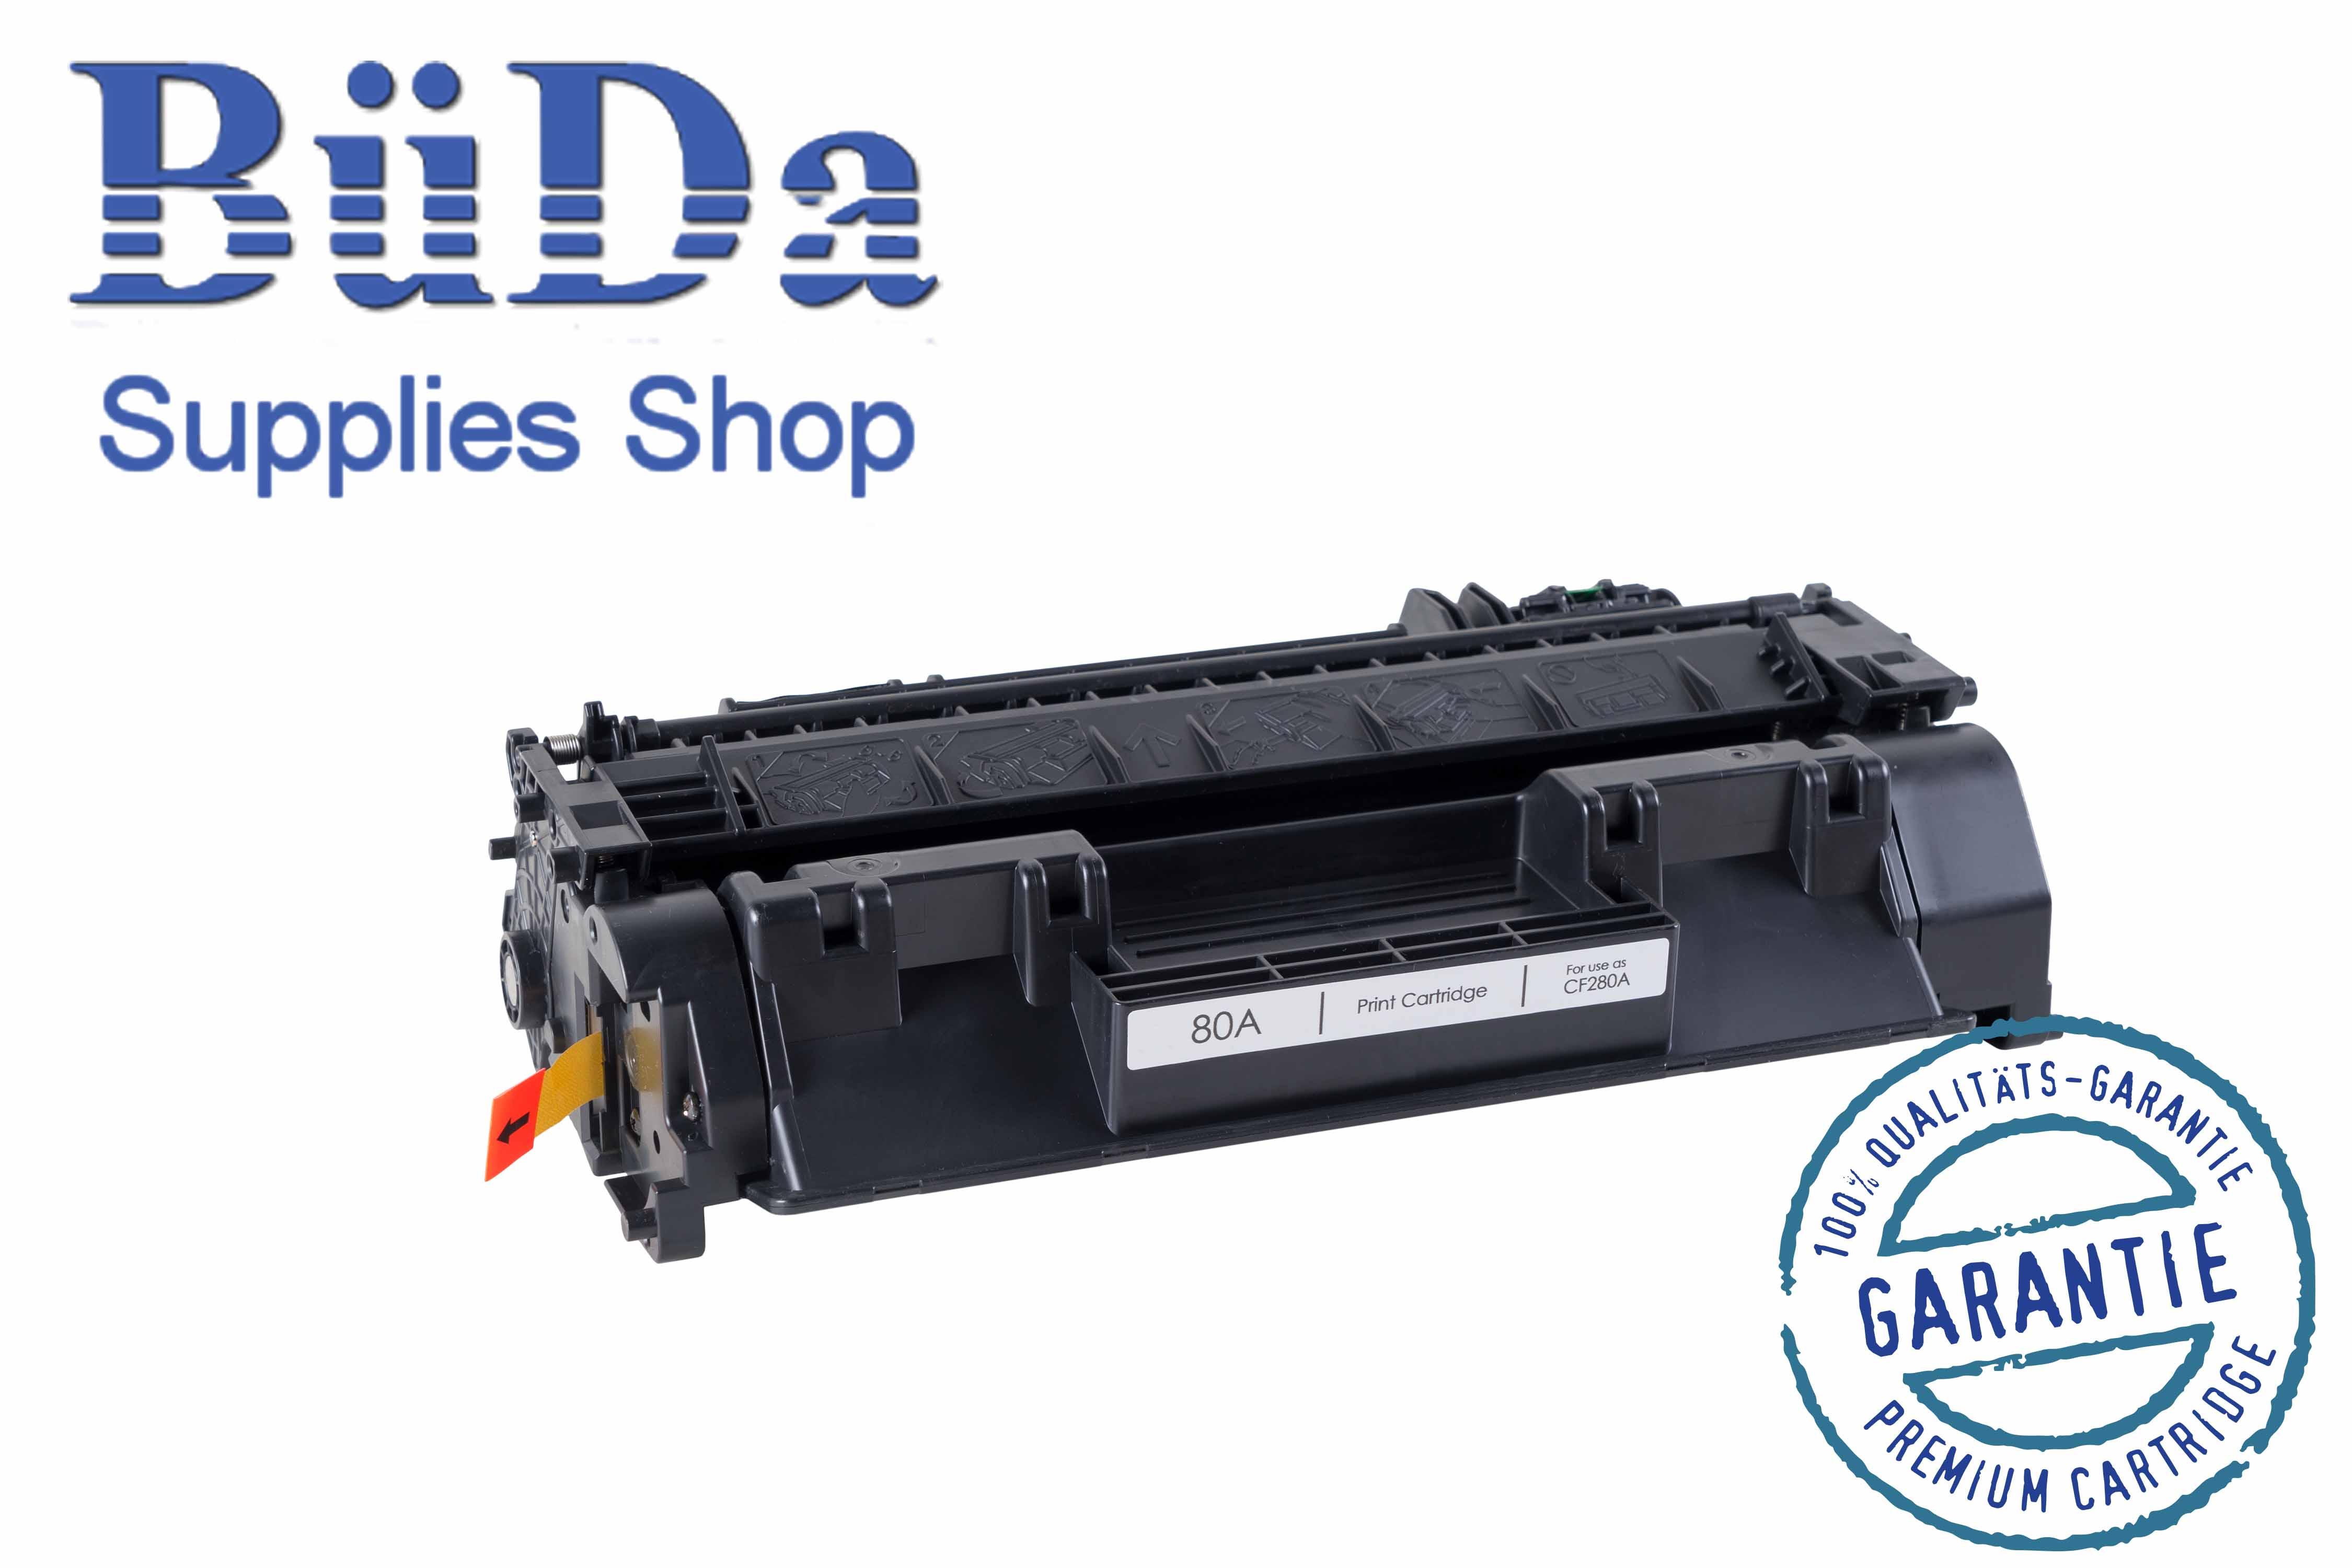 Toner-Modul komp. zu CF280A black 2700 Seiten